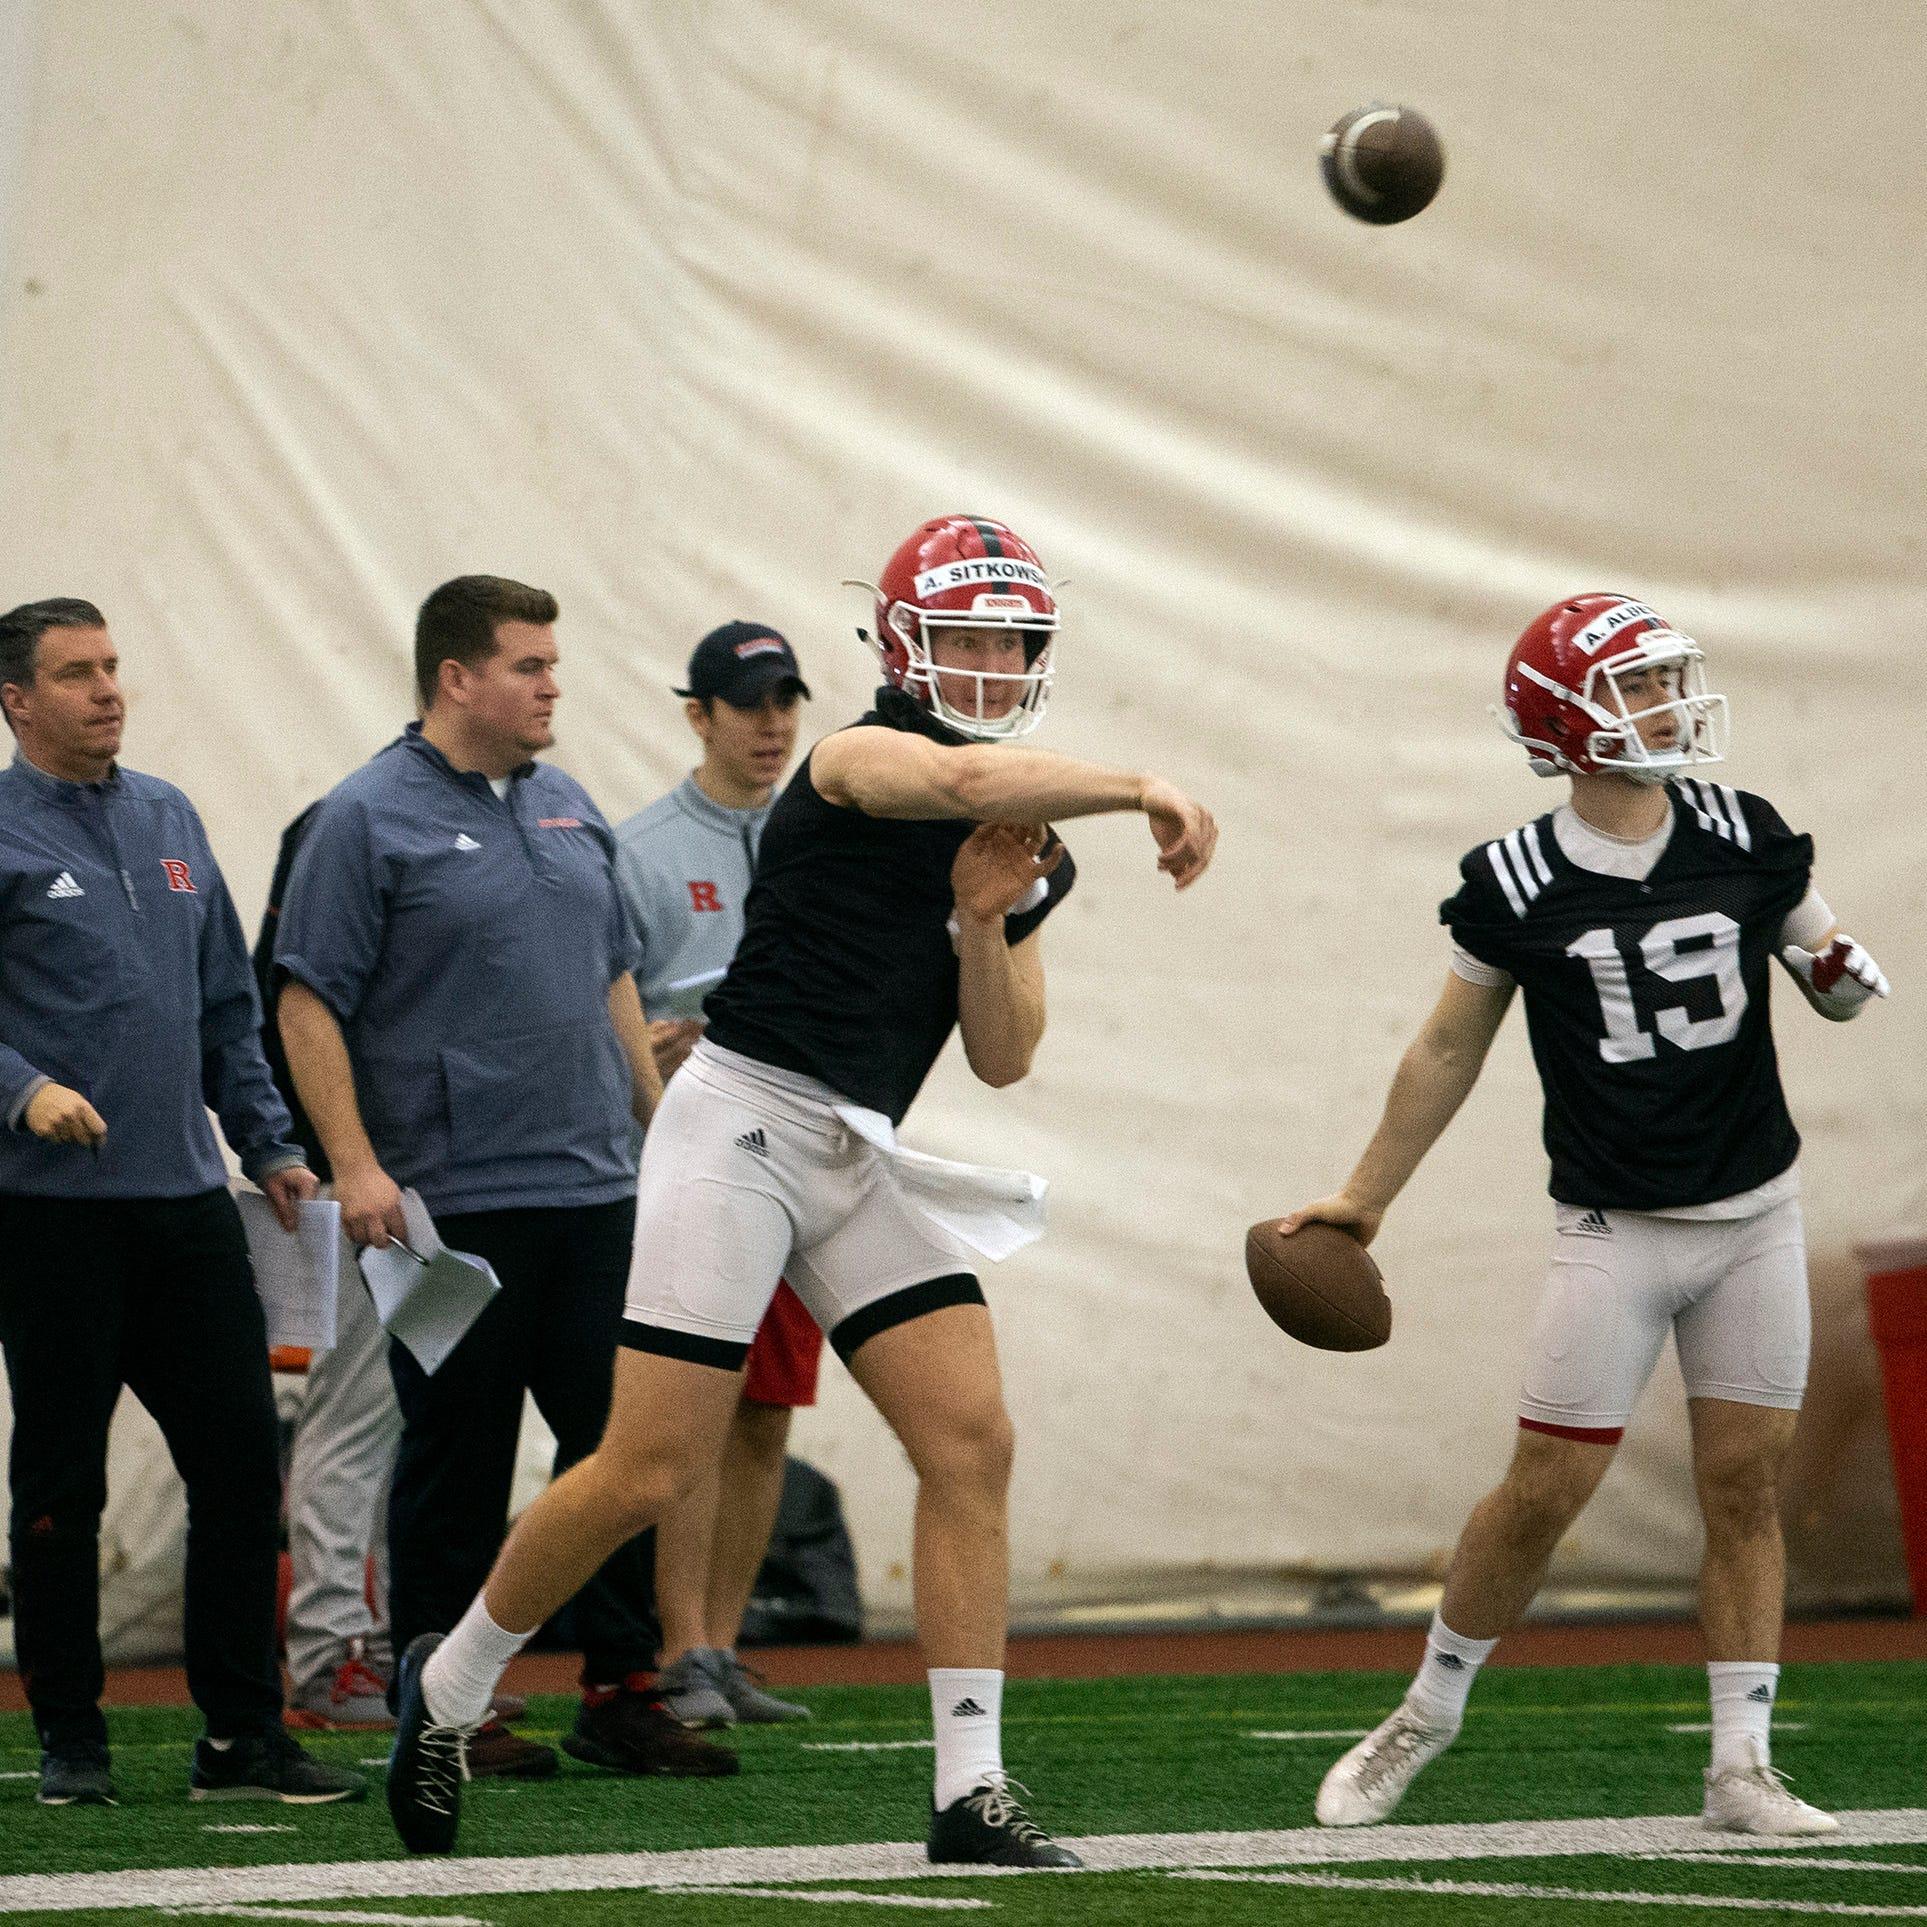 Rutgers football: Art Sitkowski now the 'old head' as QB group lacks depth, experience